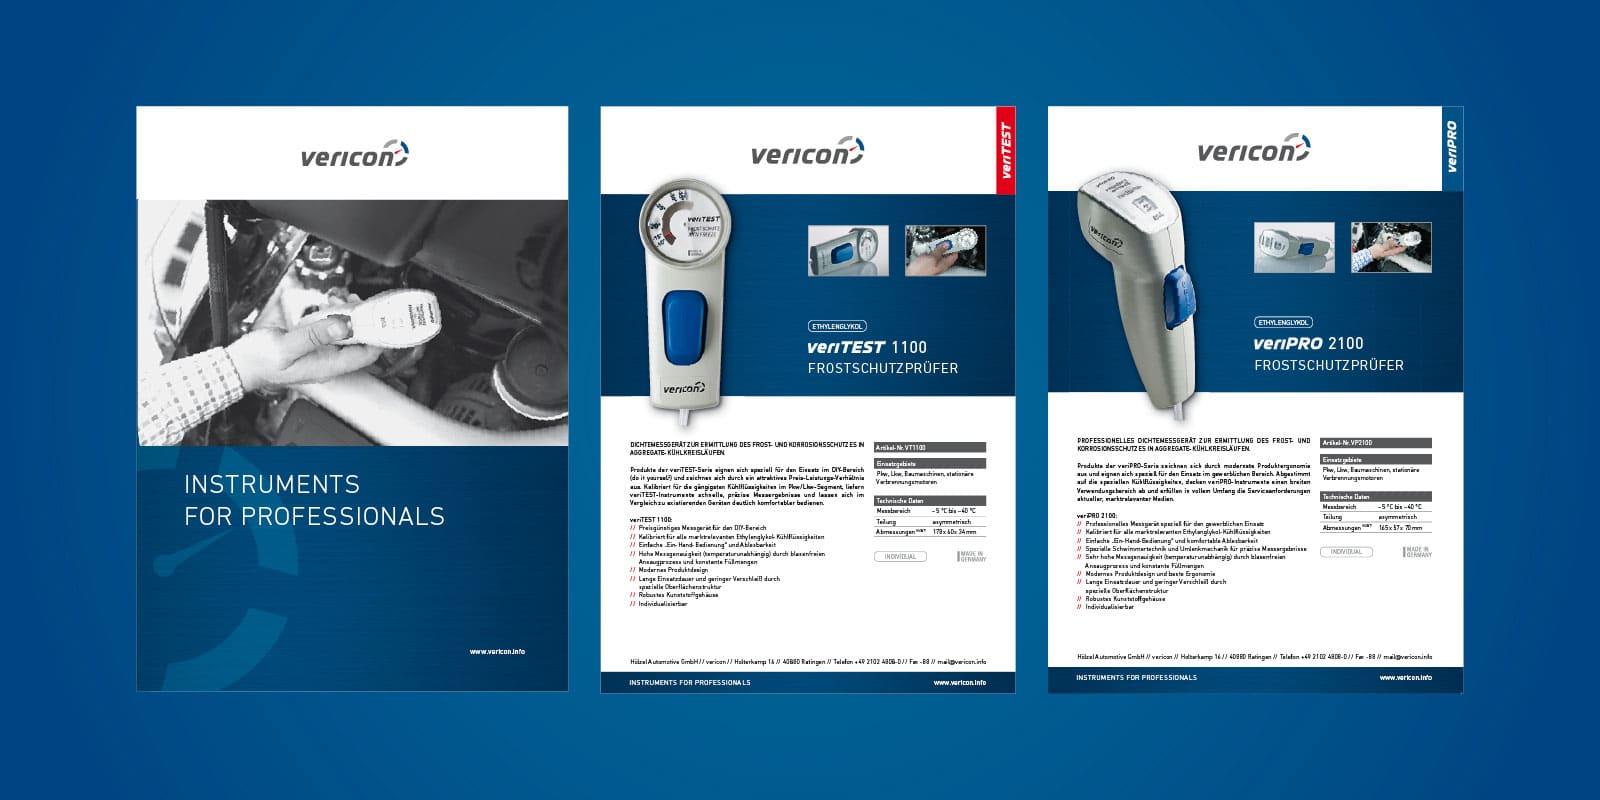 Vericon – Produktinformation